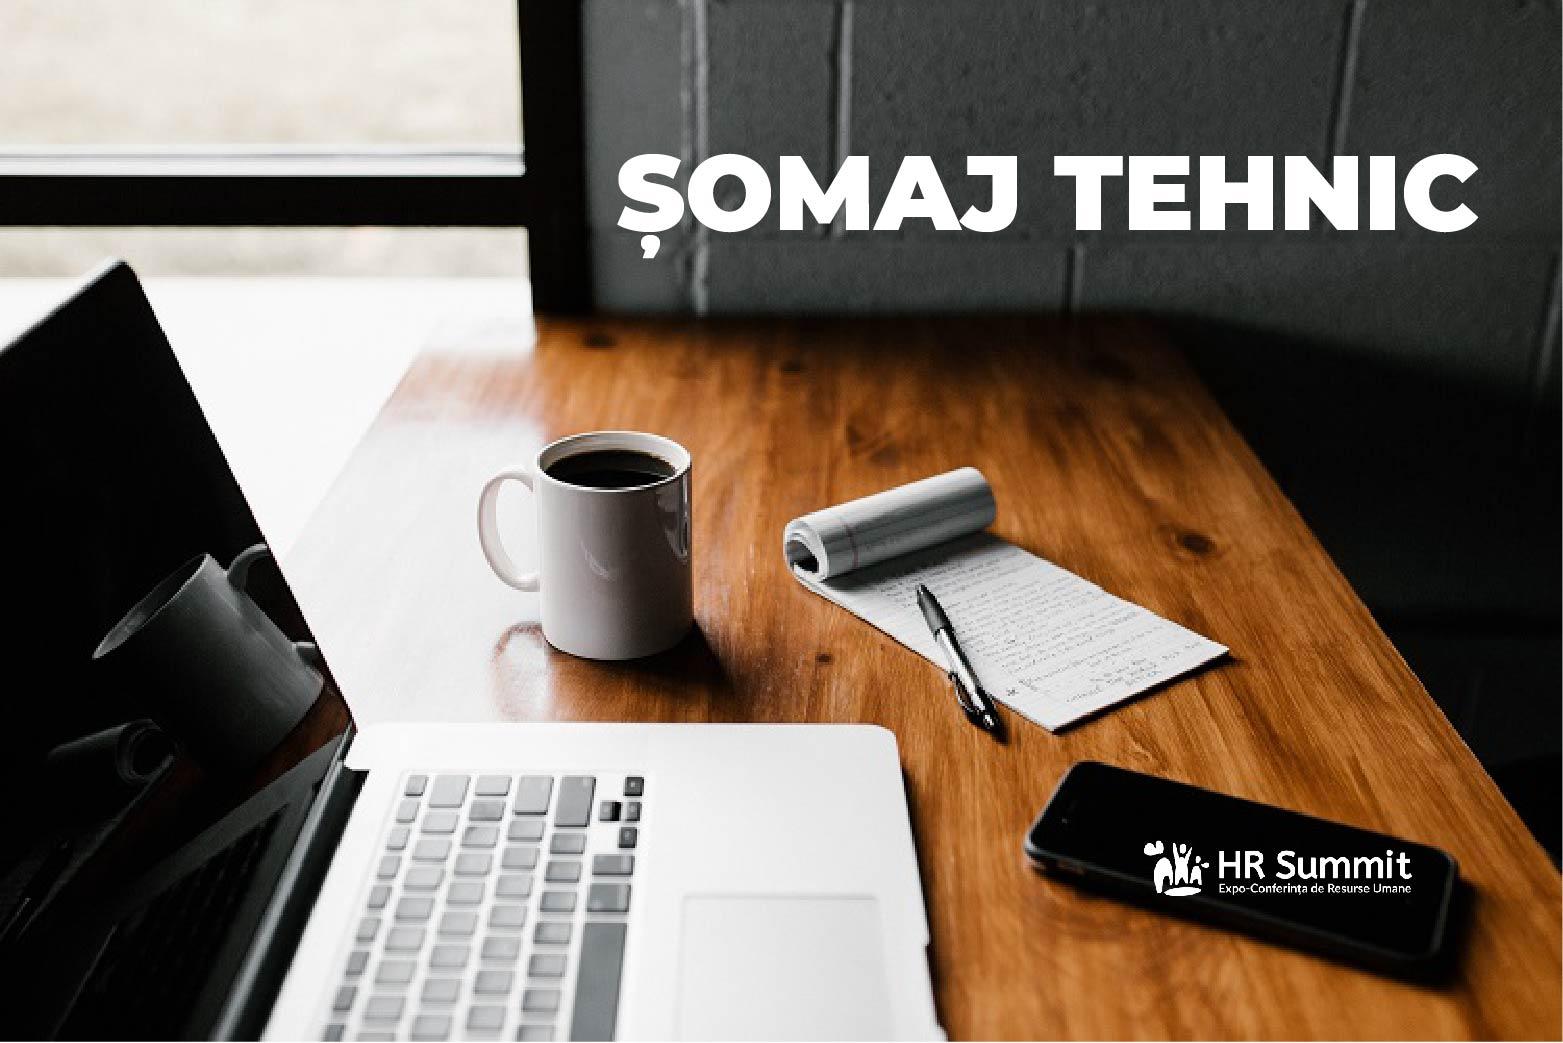 SOMAJ-TEHNIC